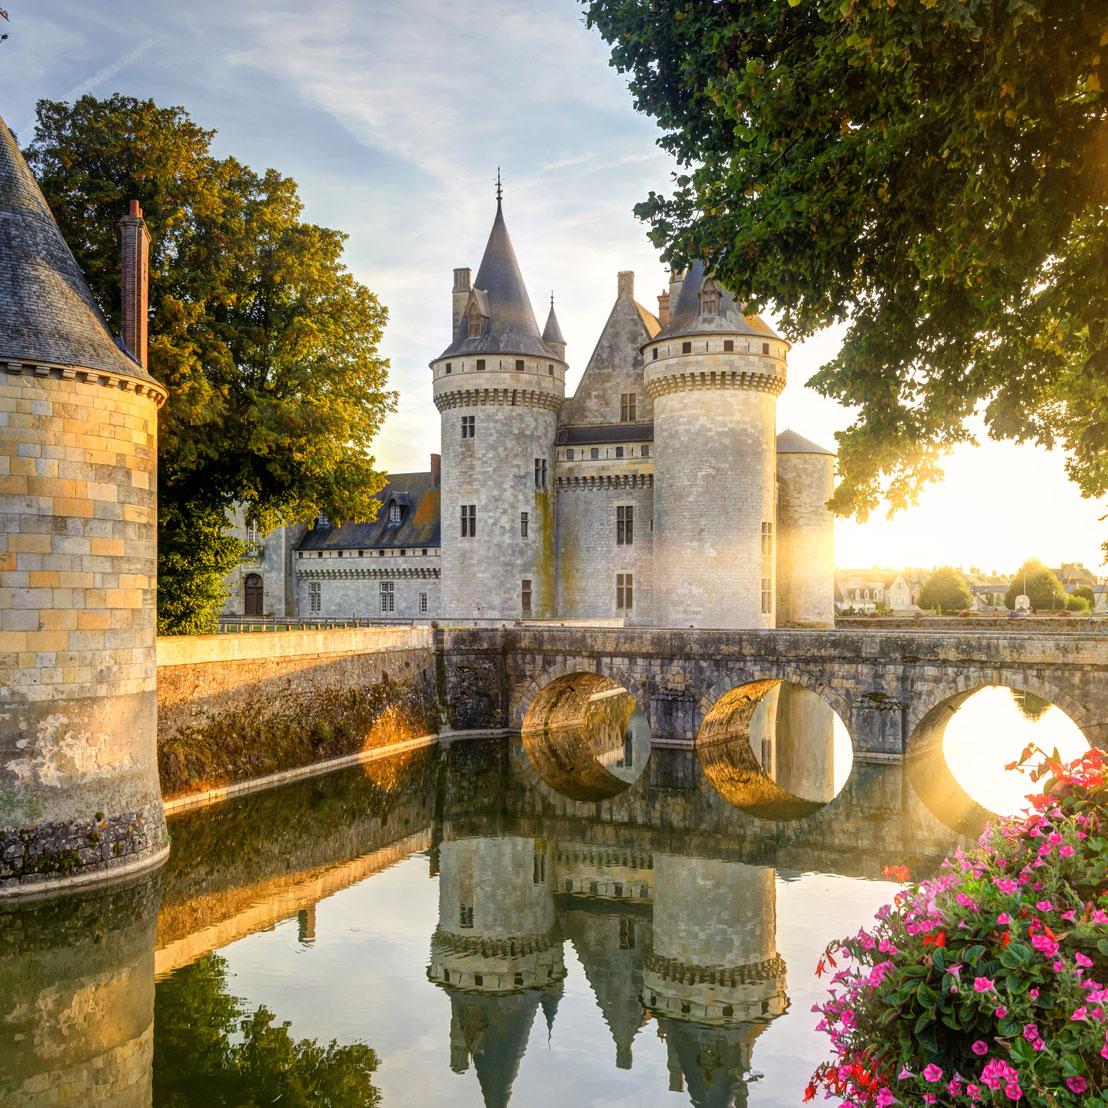 Chateau de Sully-sur-Loire in the sunset light, France